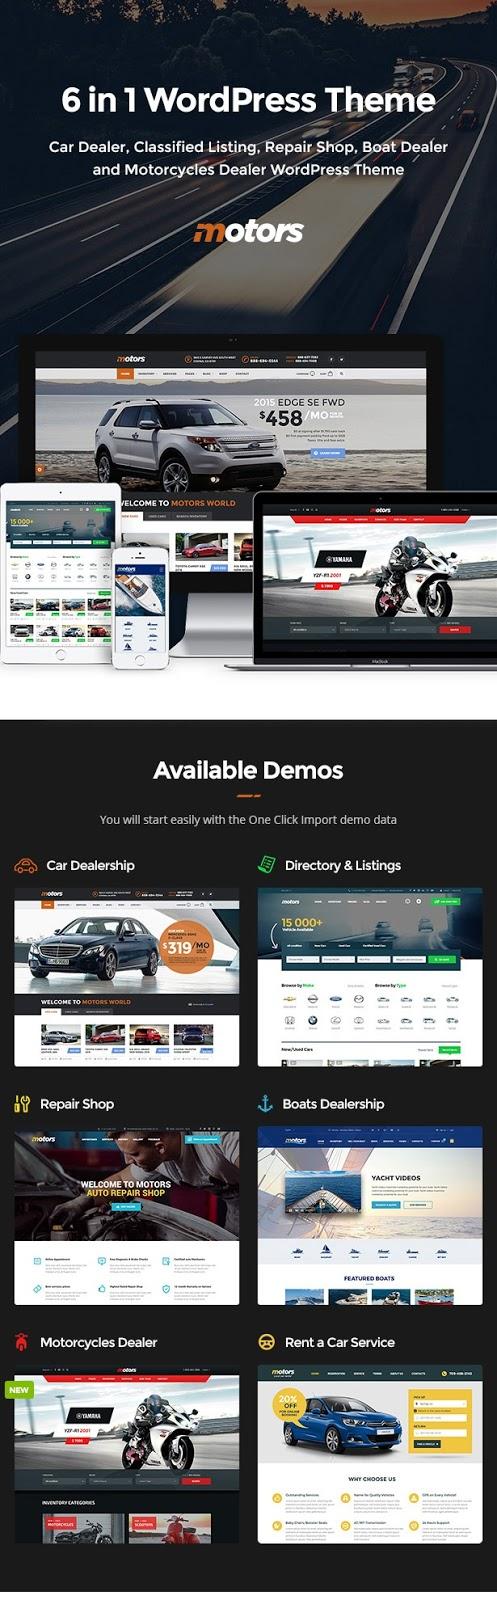 Descargar Motors theme WordPress